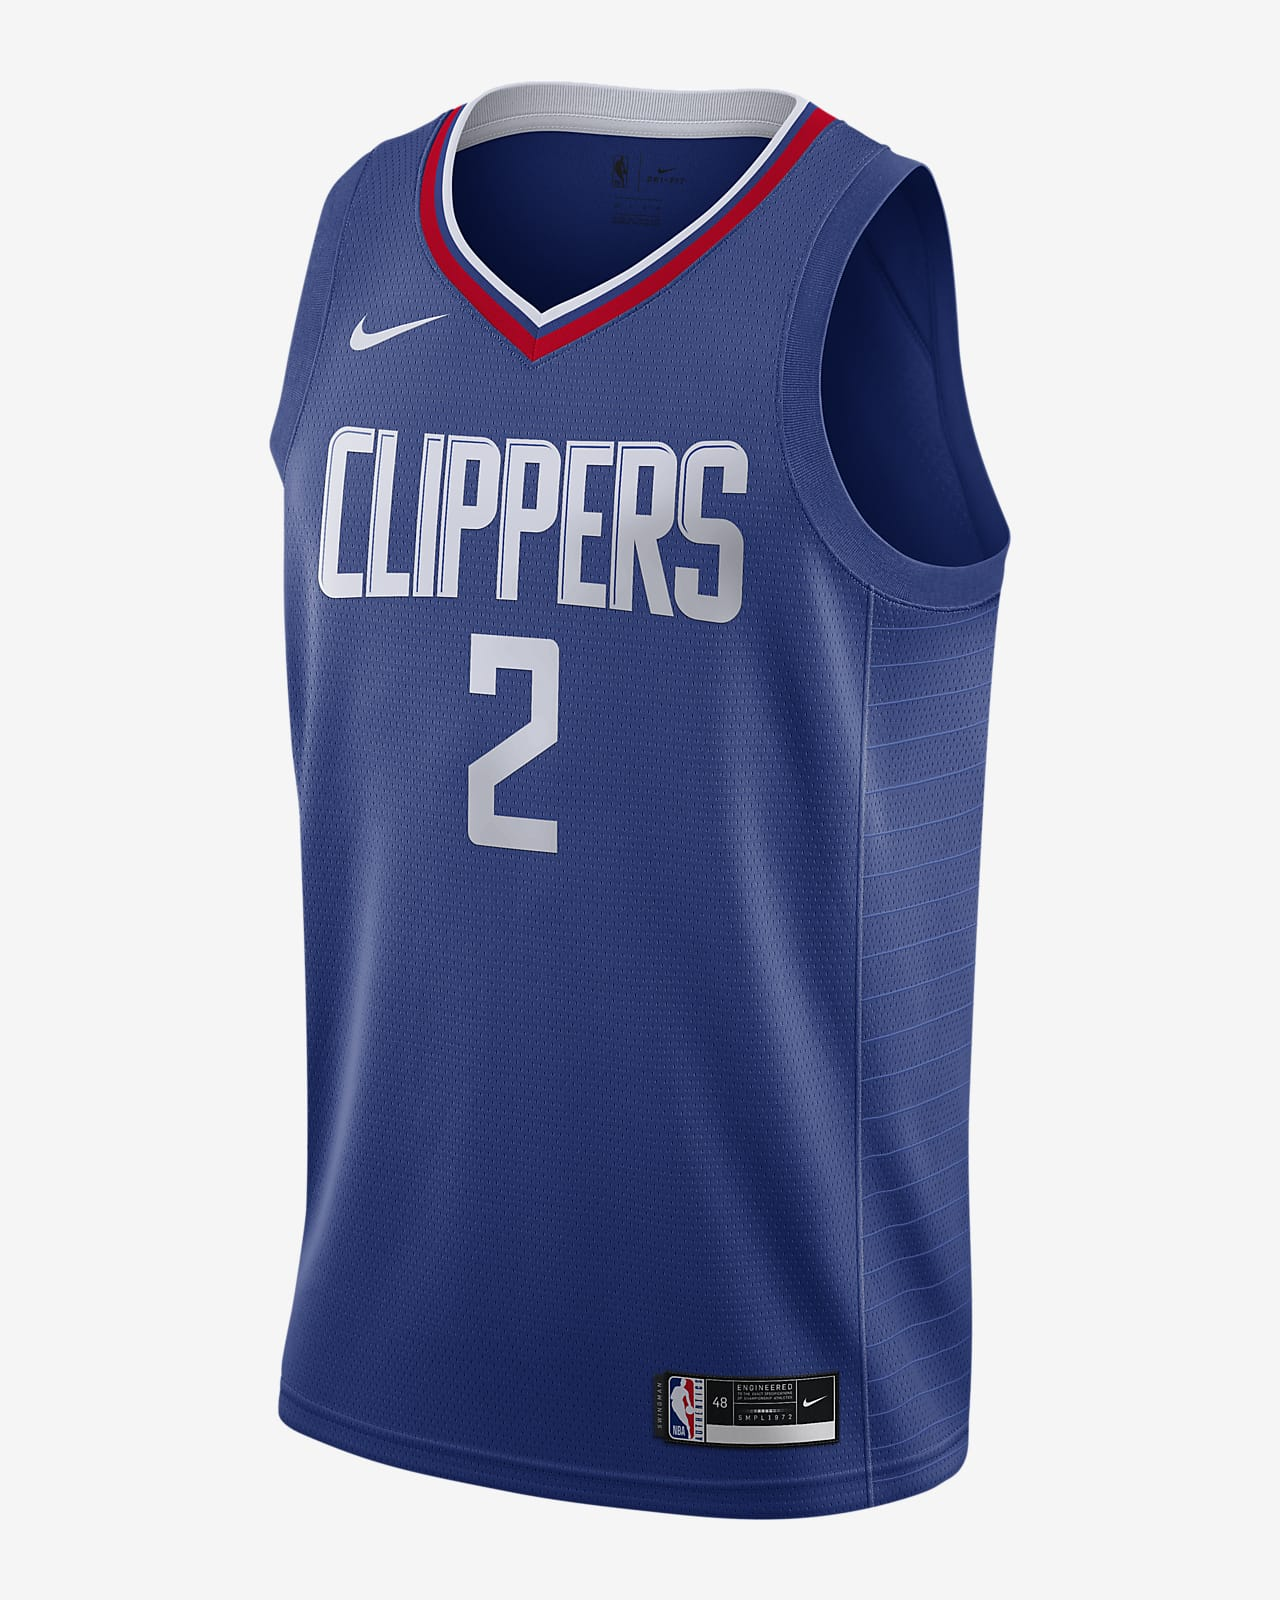 Camiseta Nike NBA Swingman Kawhi Leonard Clippers Icon Edition 2020